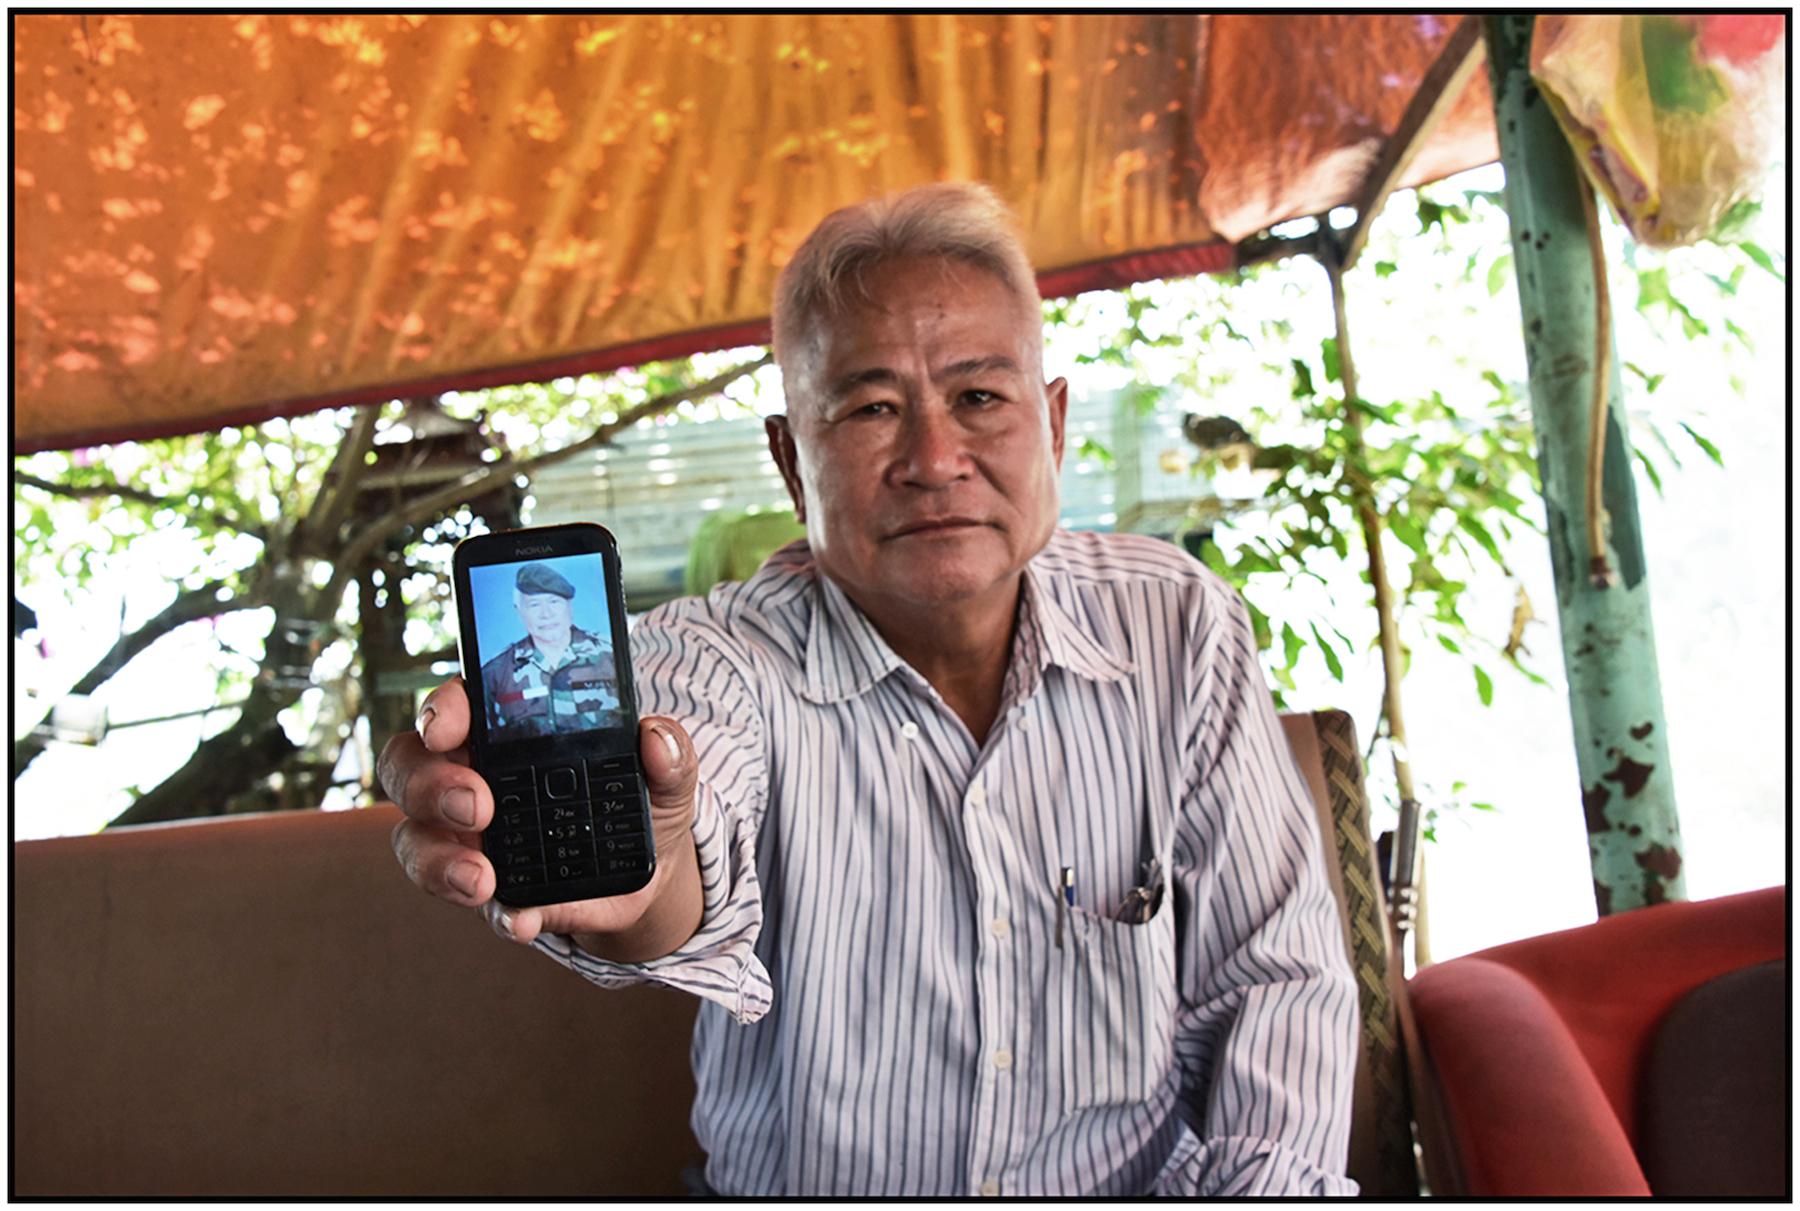 Former officer in S. Vietnamese army in his uniform, Saigon/HCMC, Dec. 2015. #5371